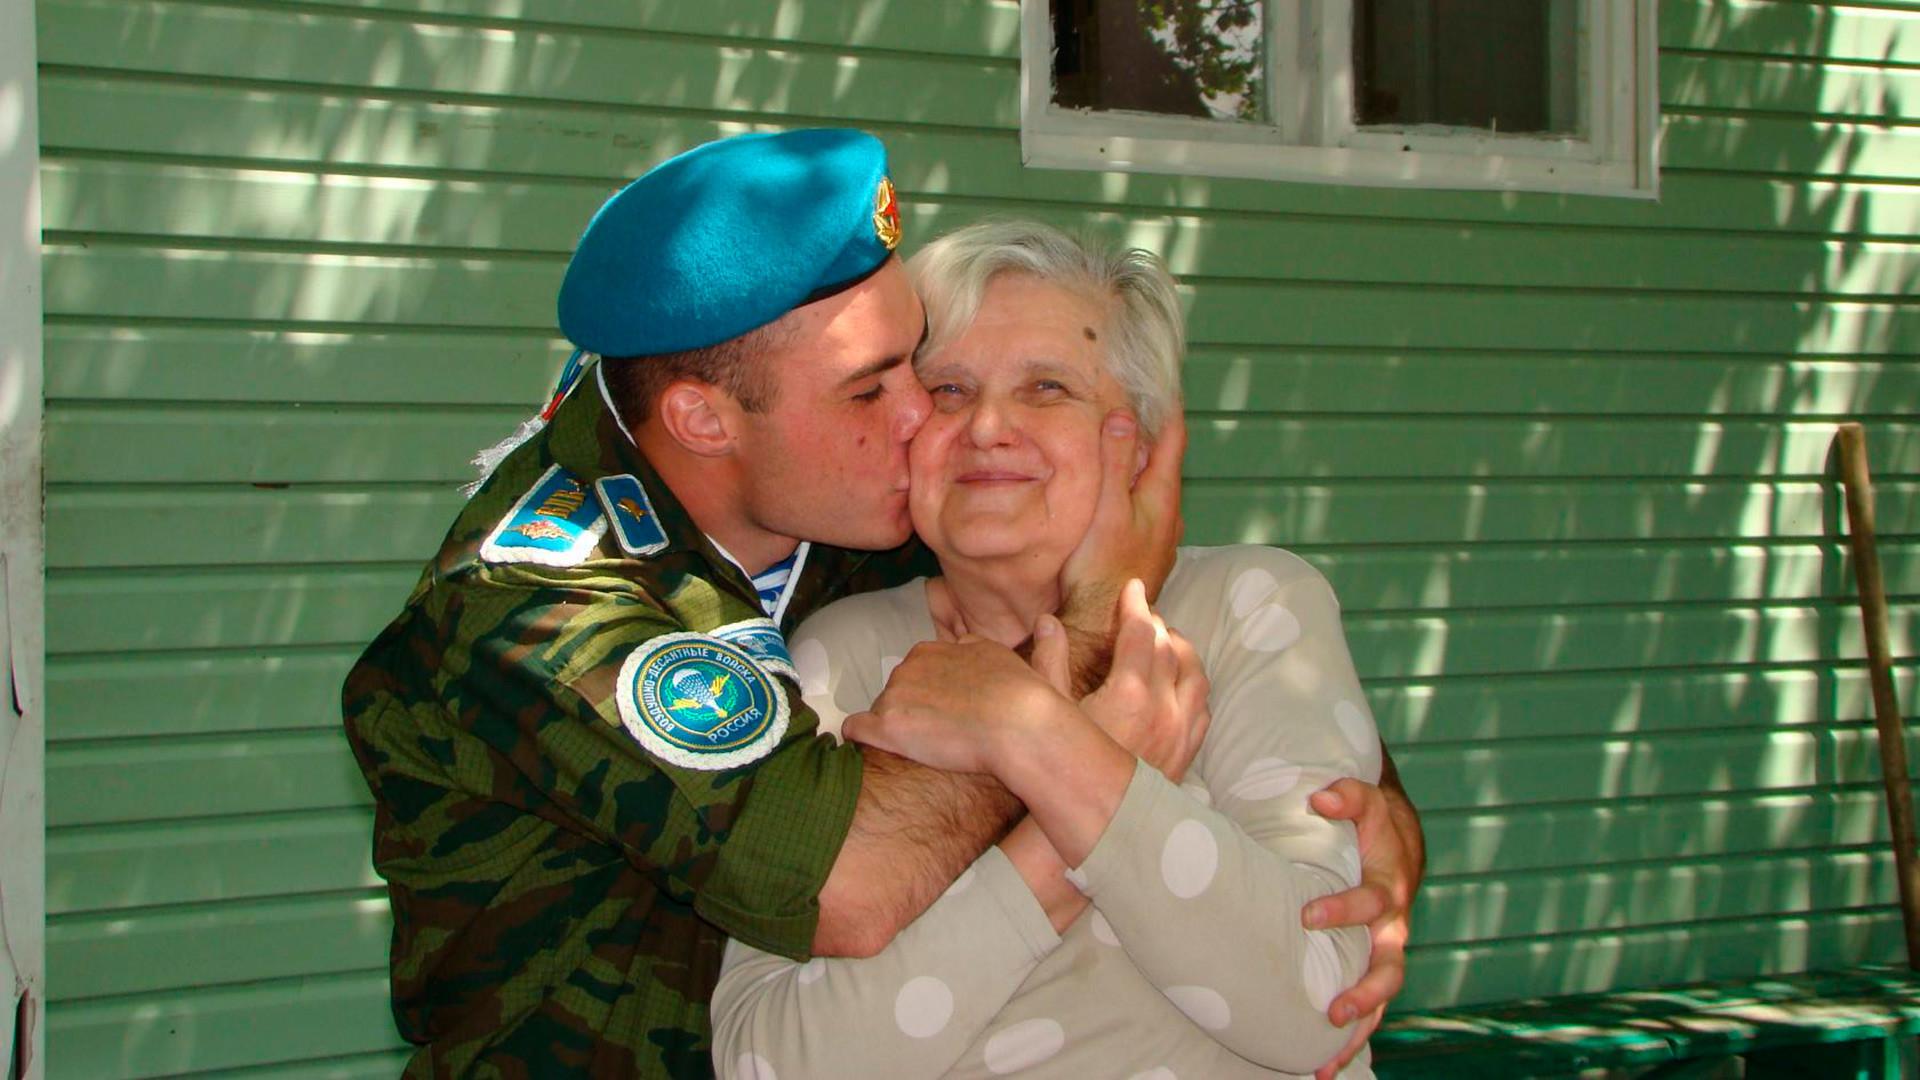 Anak angkat Tatiana mencium ibunya ketika pergi untuk melakukan wajib militer (Mei 2018).